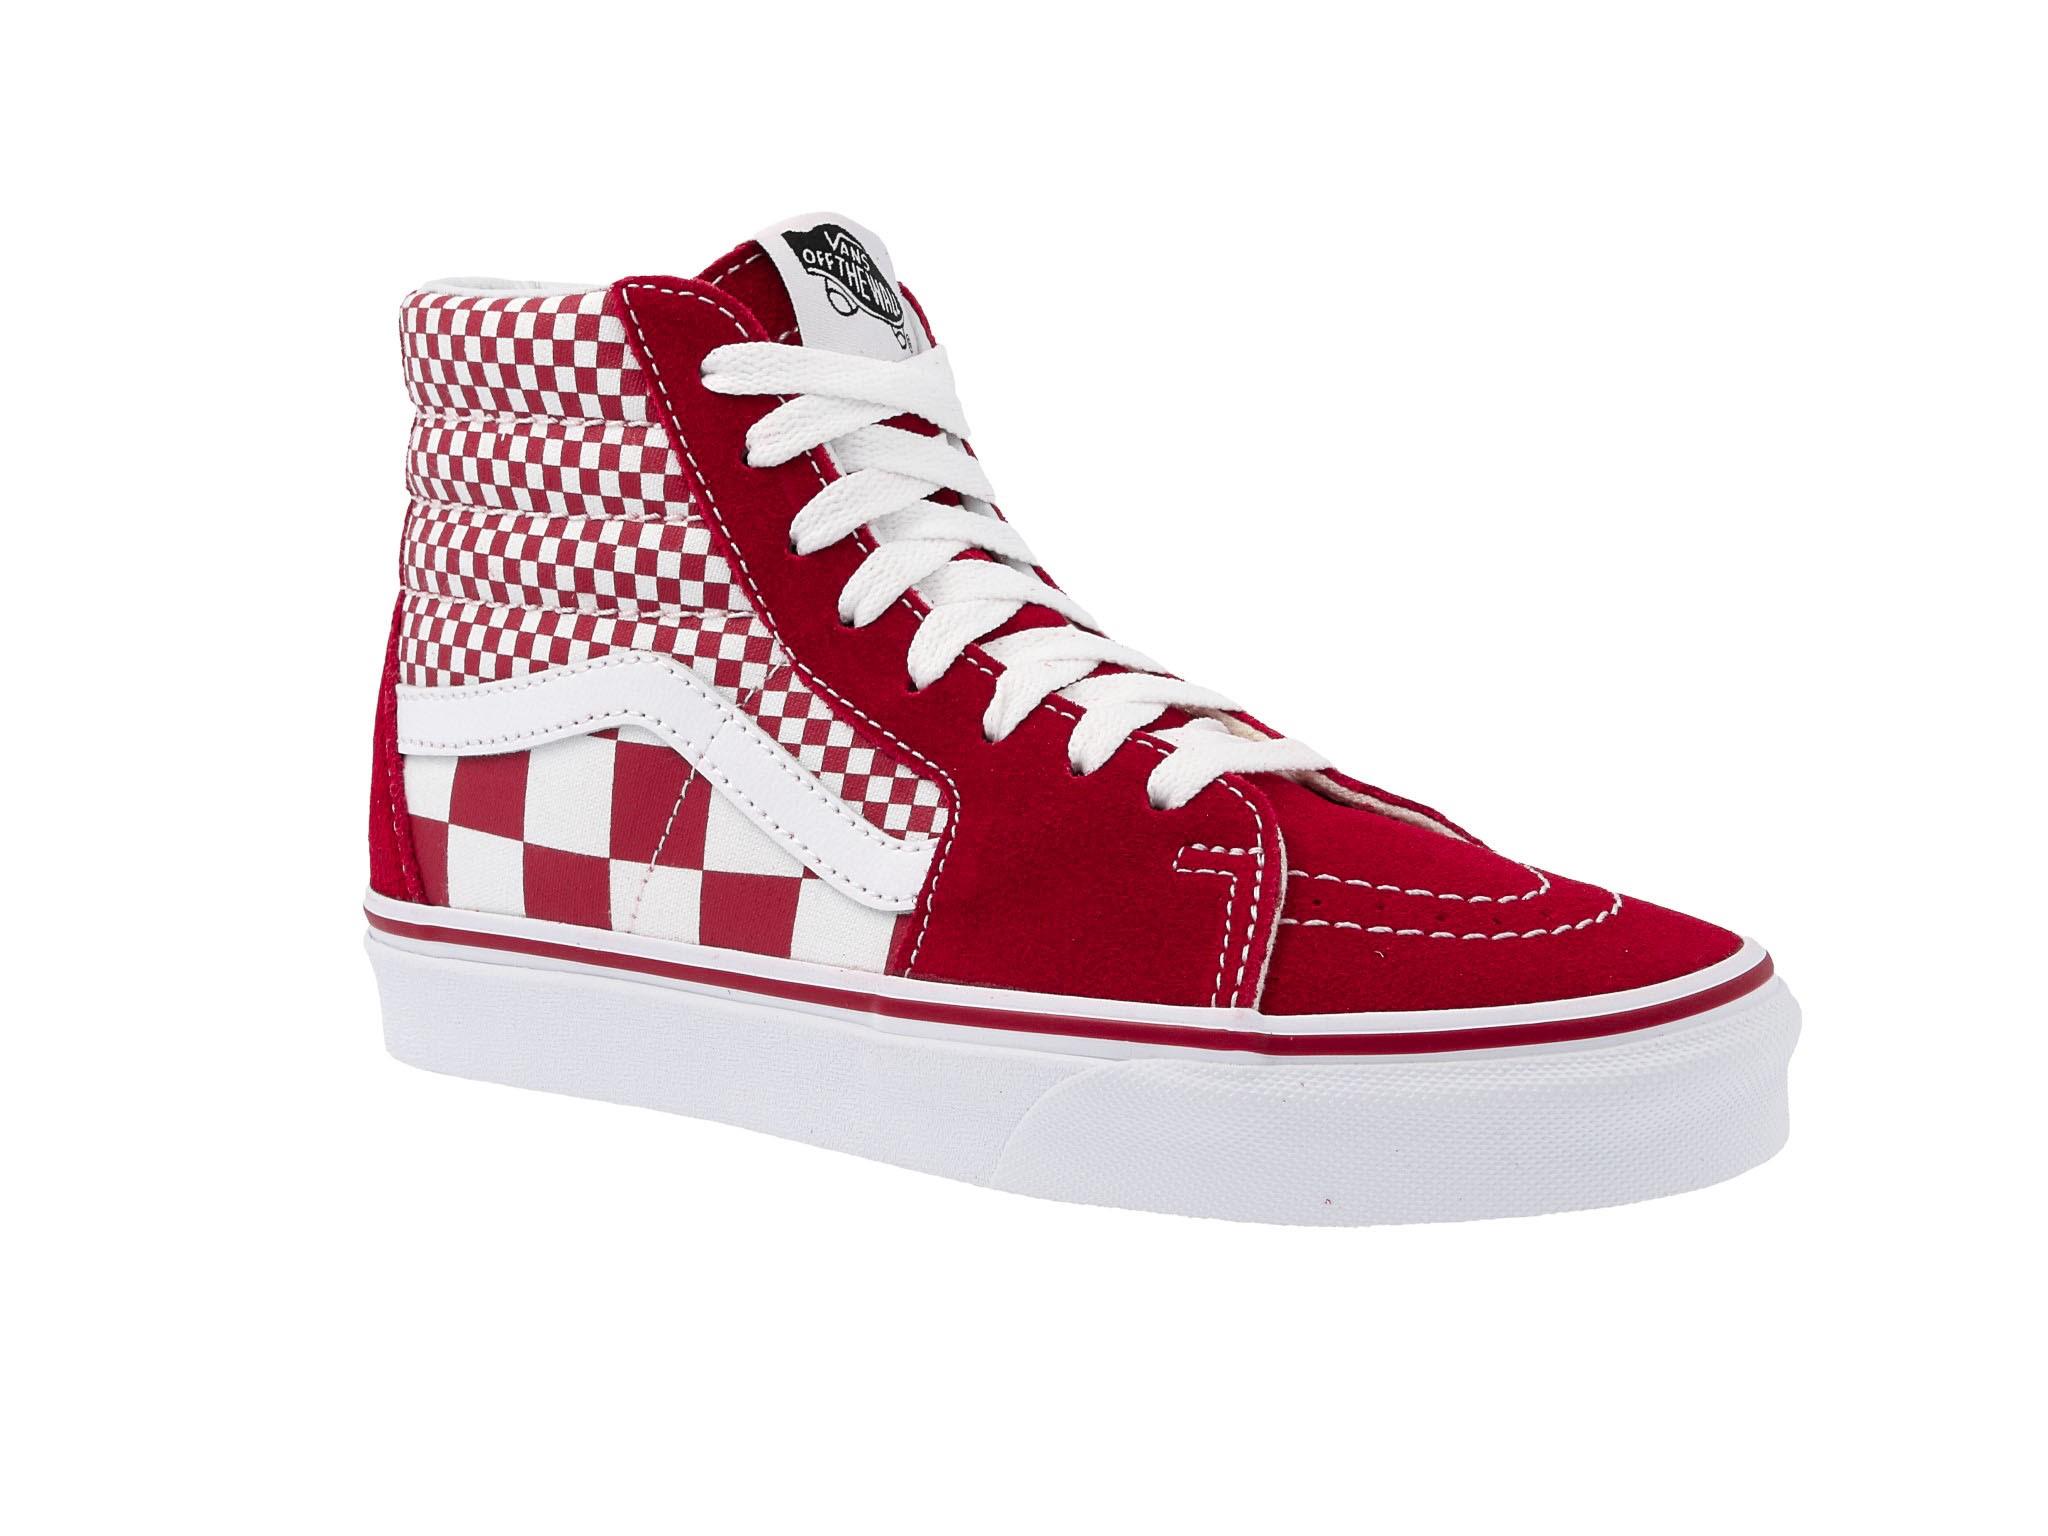 Vans Sneakers Sk8 Hi VN0A38GEVK51 (Mix Checker) CHili Pepper